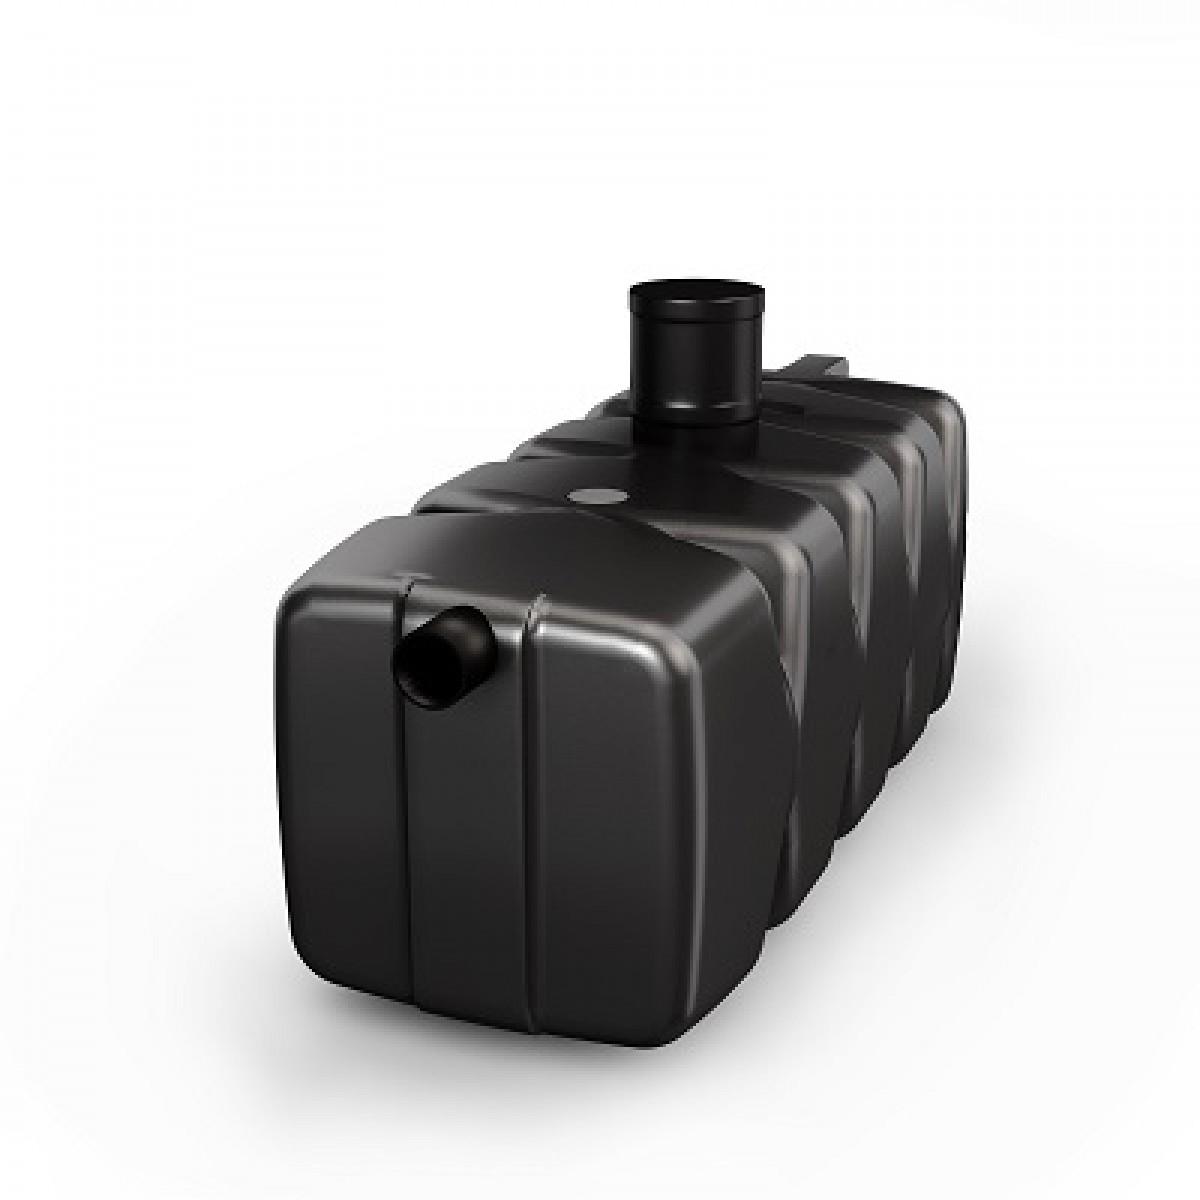 erdspeicher monobloc 900 liter. Black Bedroom Furniture Sets. Home Design Ideas